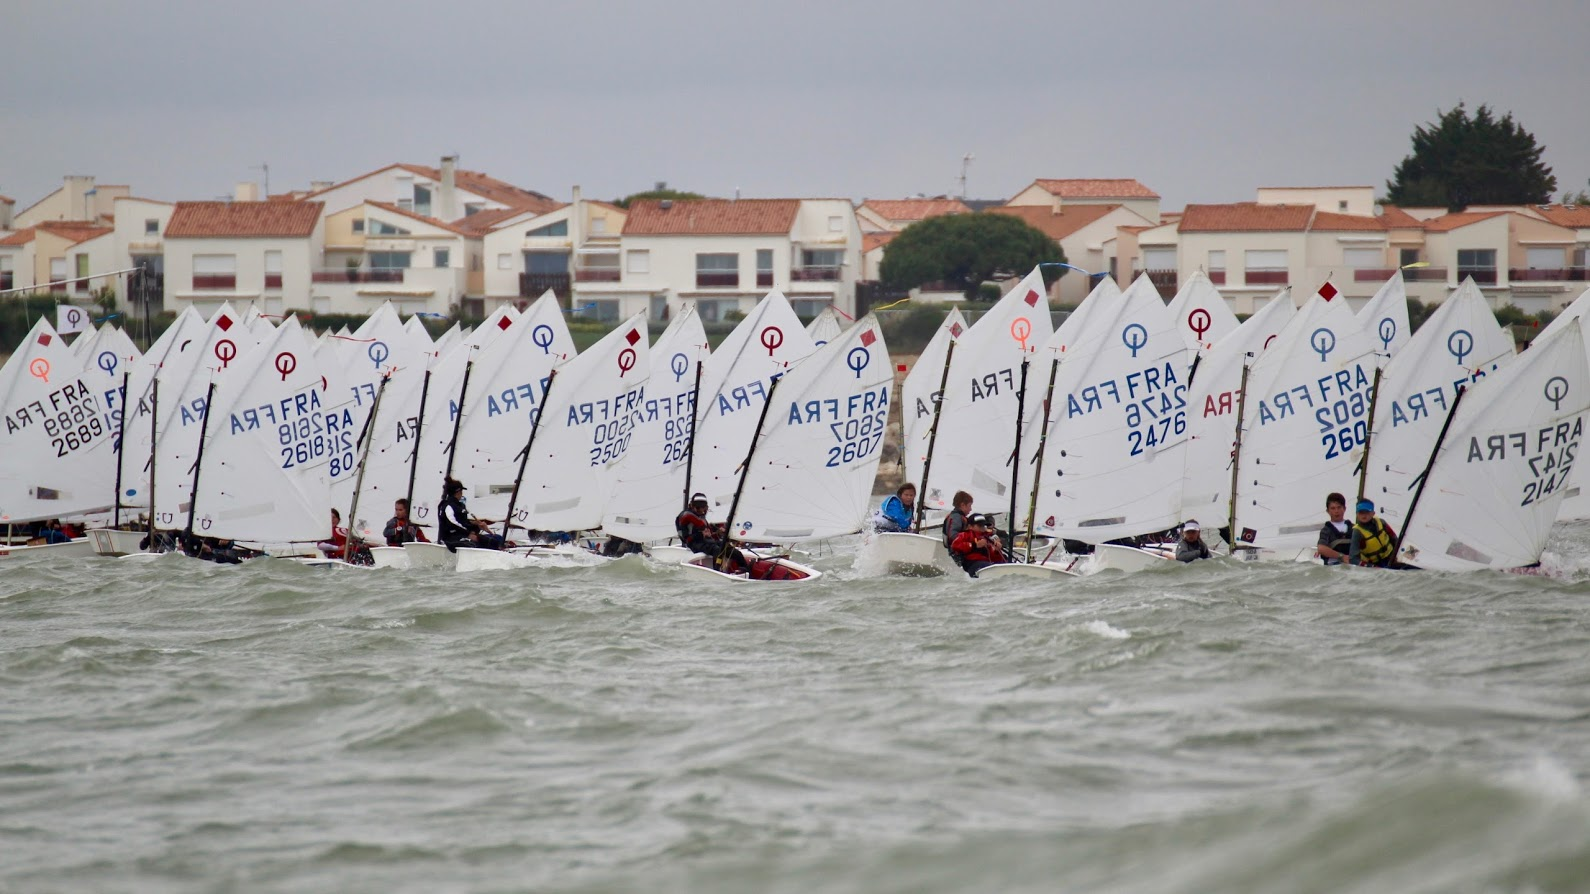 Optimist - Coupe Internationale - La Rochelle FRA - day 1